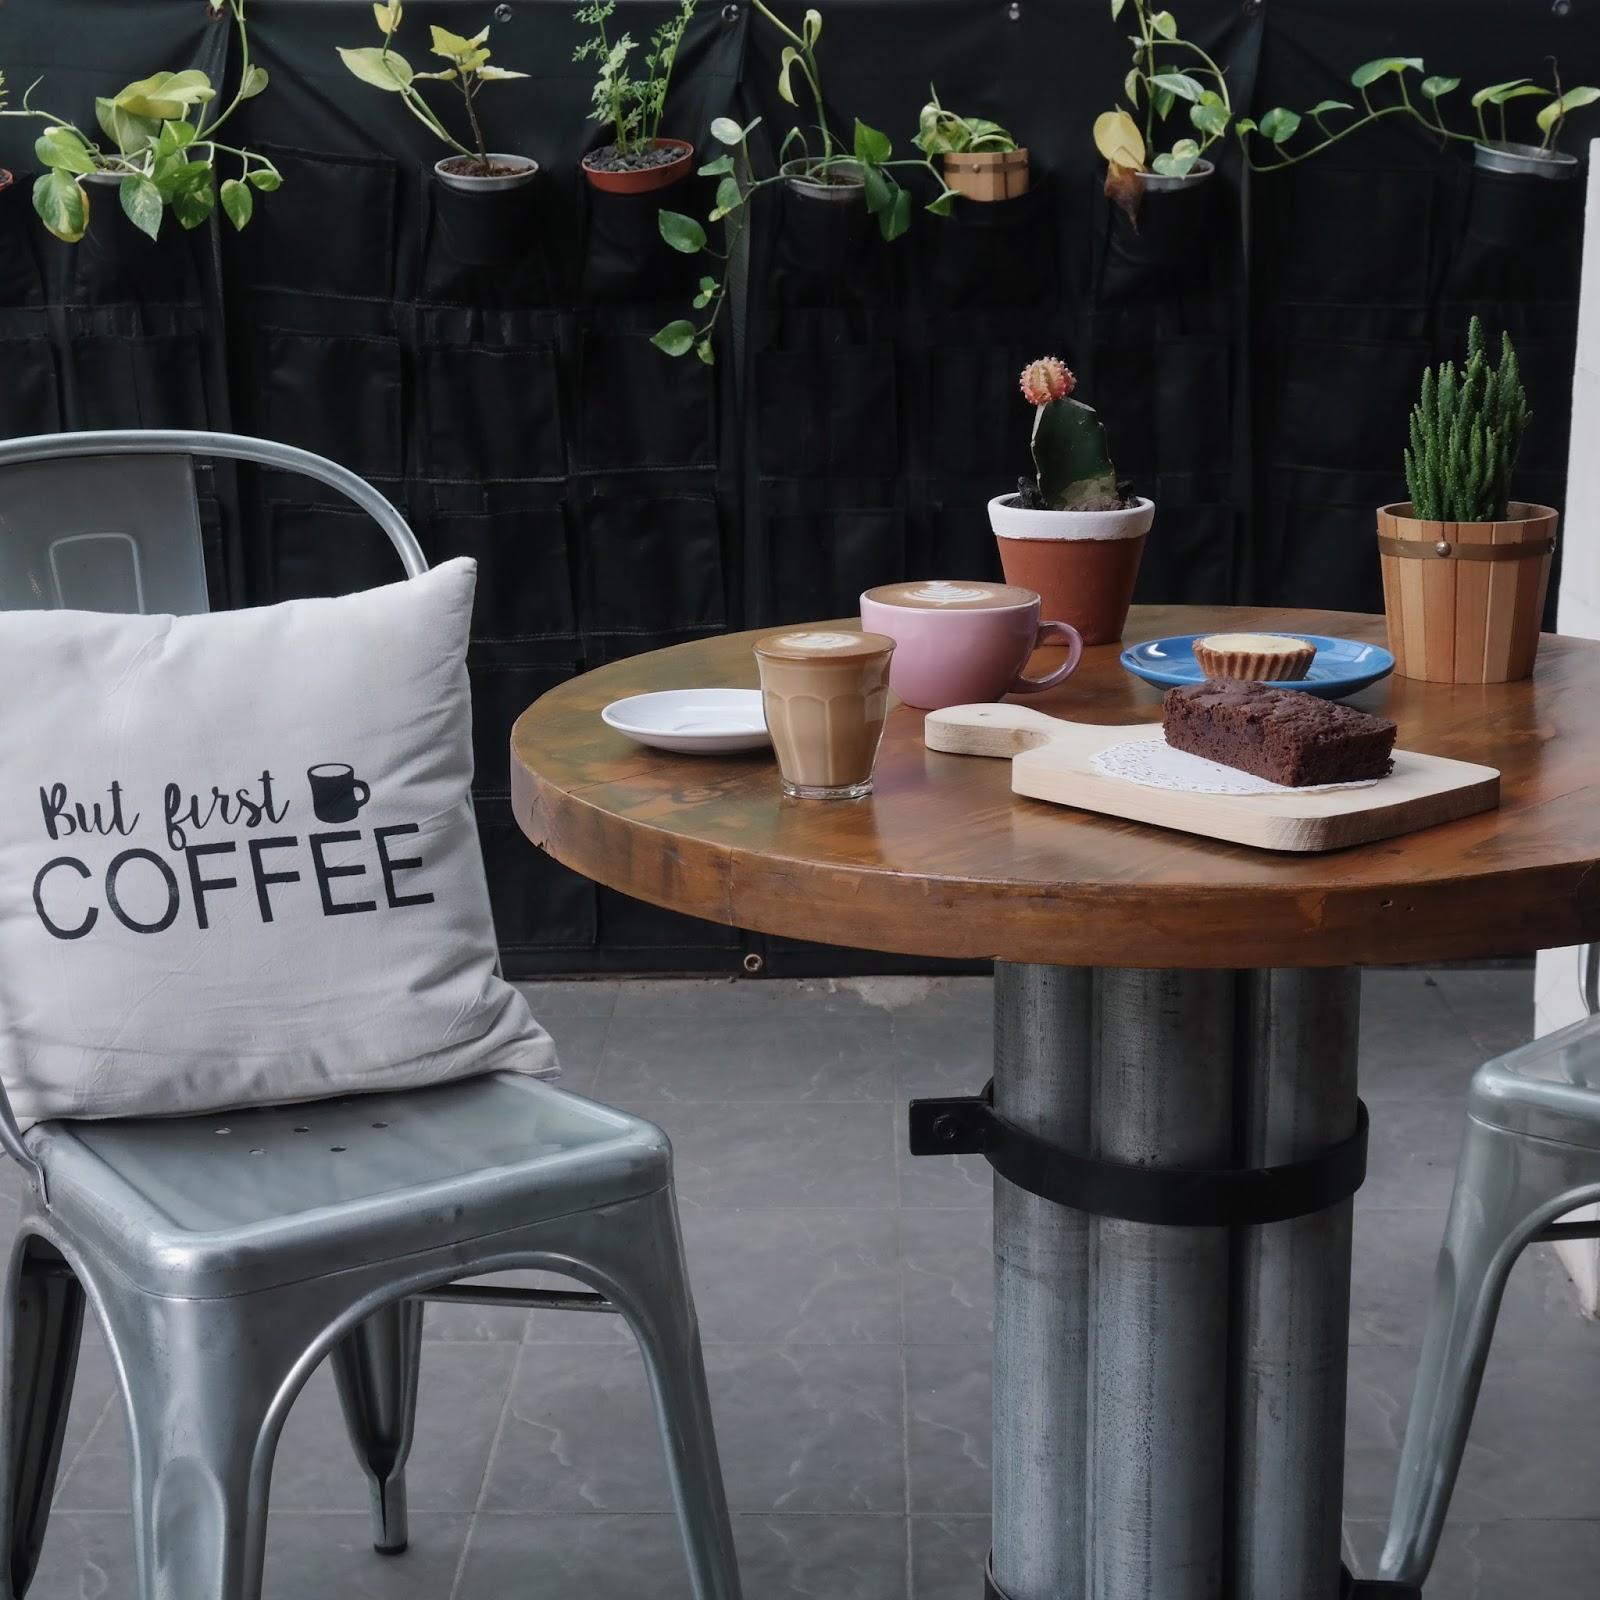 Tummy Prosperity Kalaku Coffee and pany